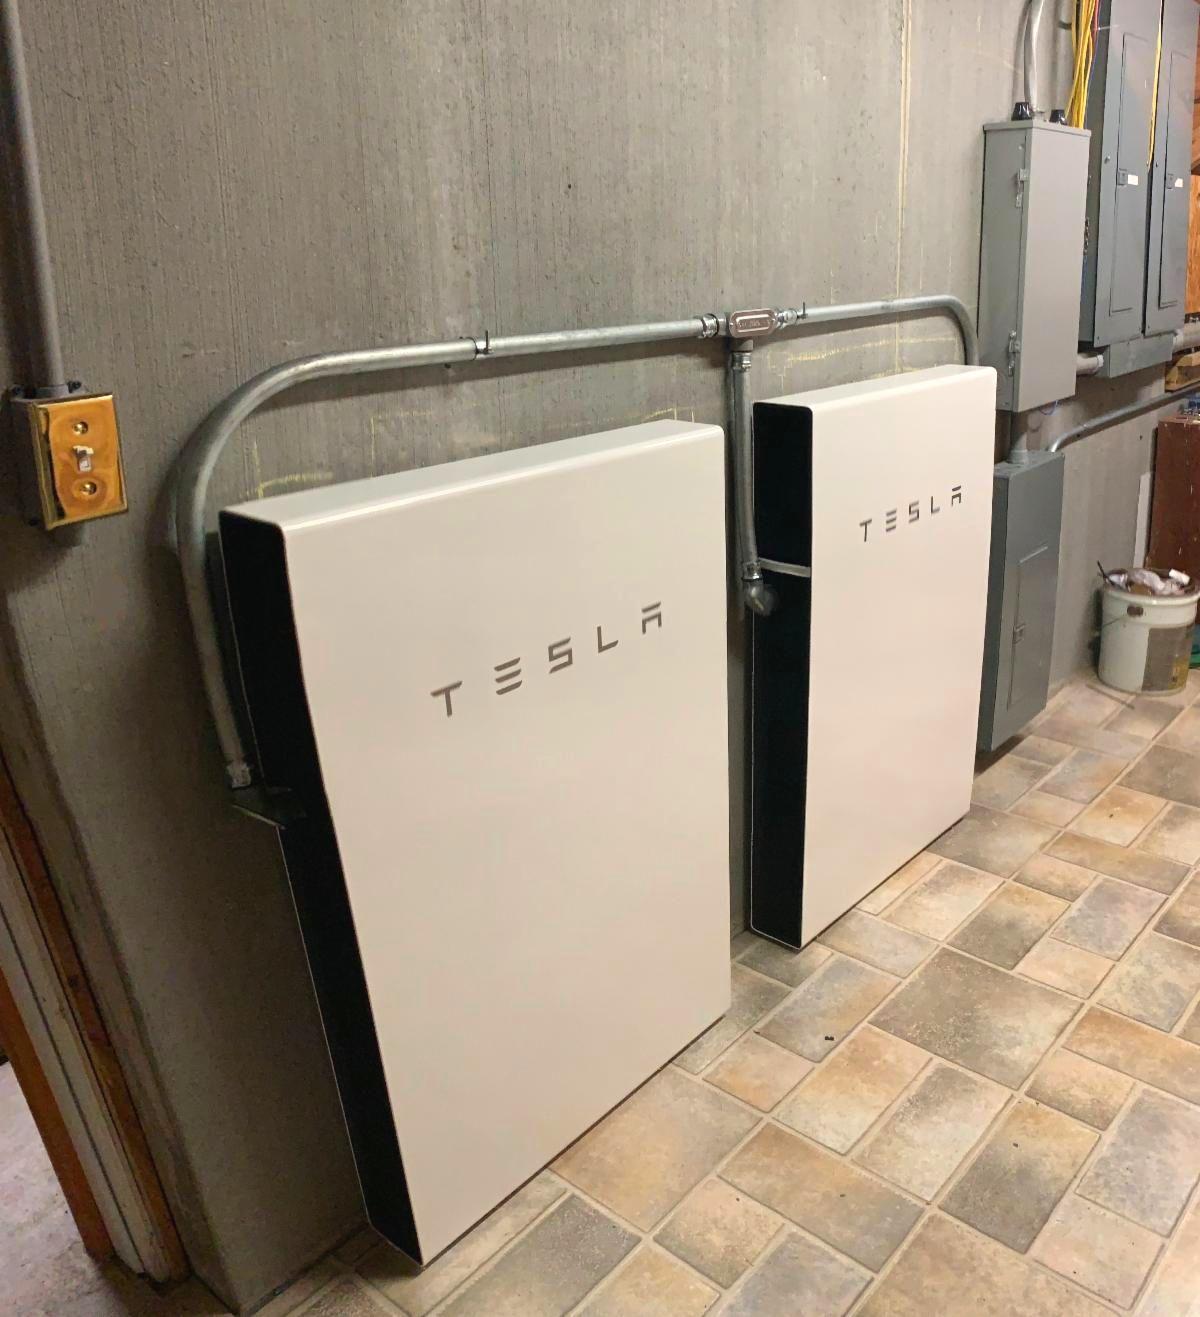 Tesla Powerwall system installed by LightWave Solar